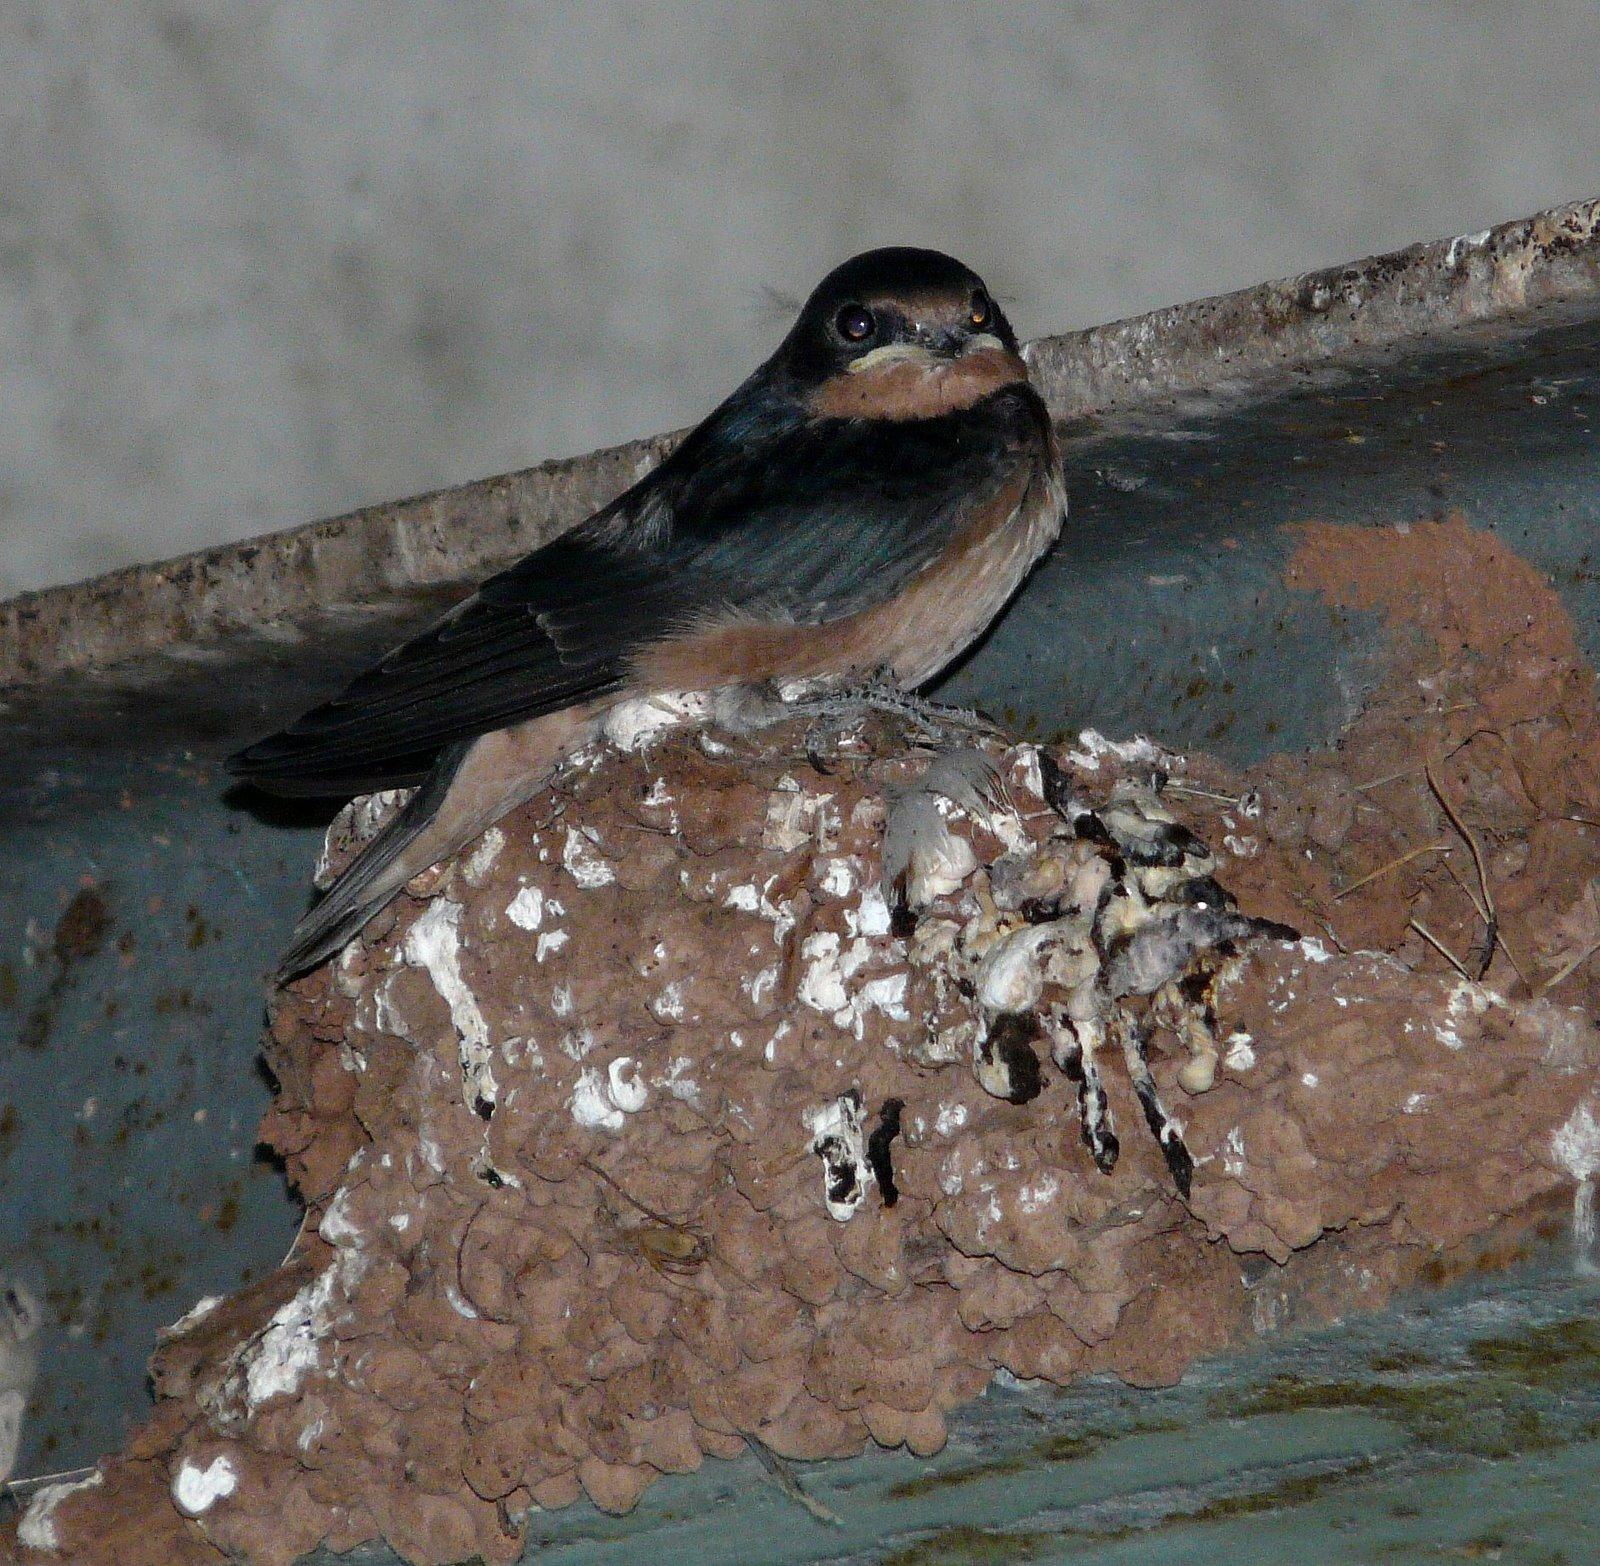 Baby Barn Swallows- New Jersey Bird Photos